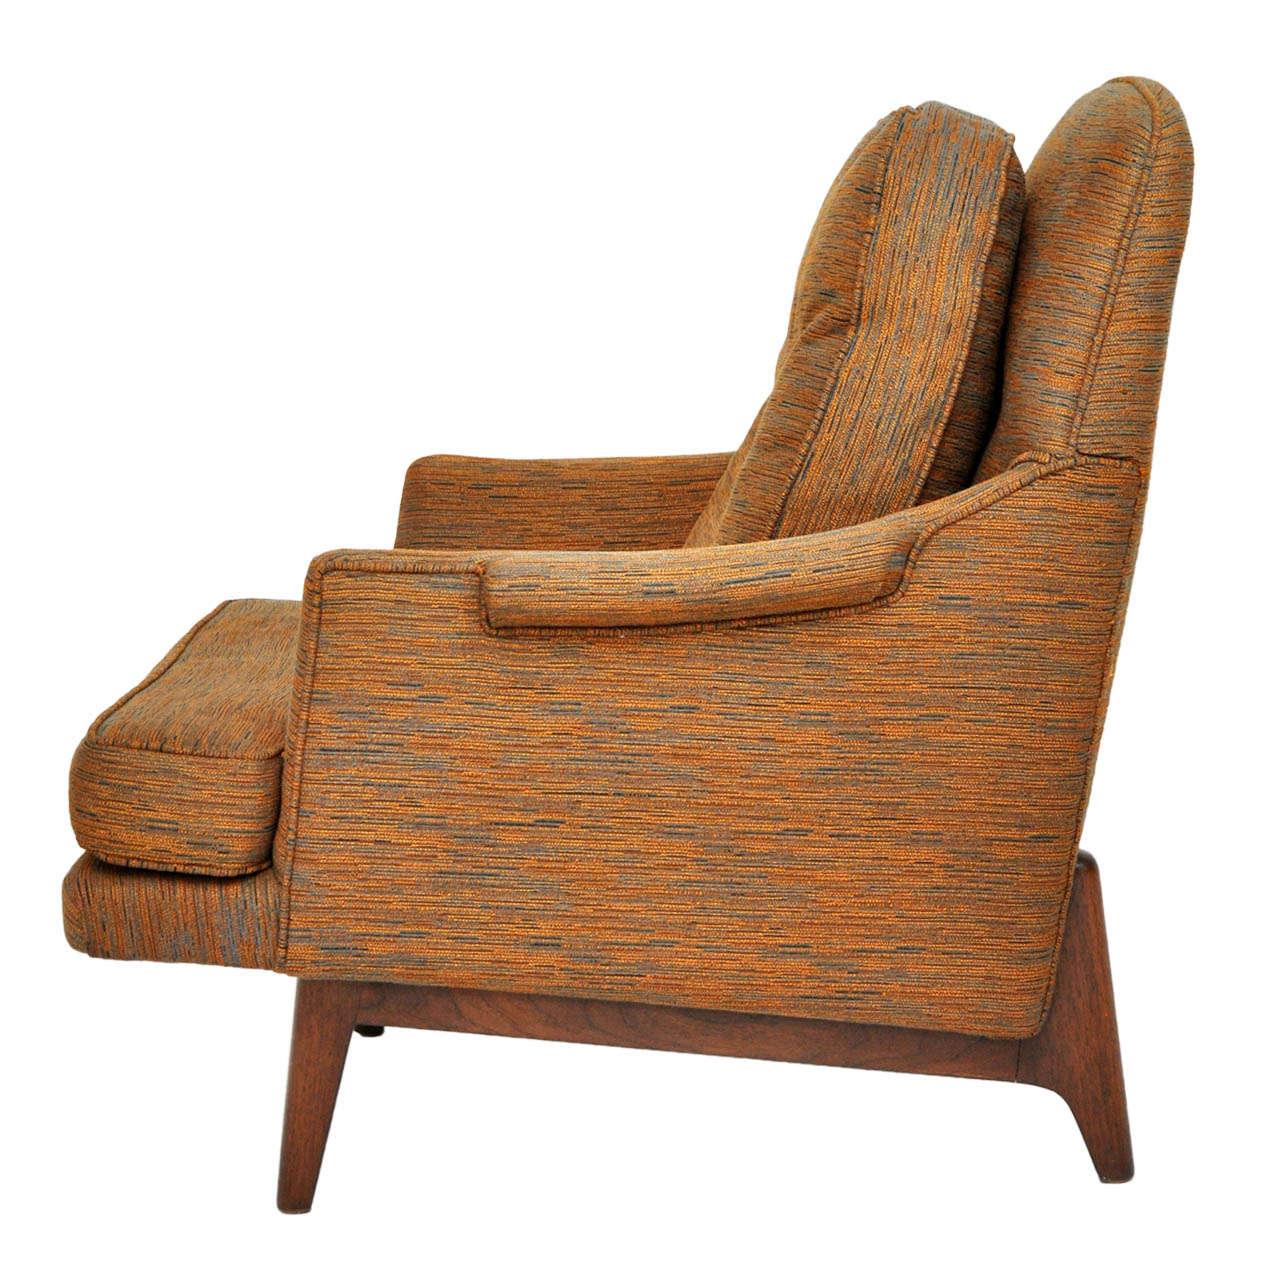 Dunbar janus lounge chair edward wormley at 1stdibs - Edward wormley chairs ...